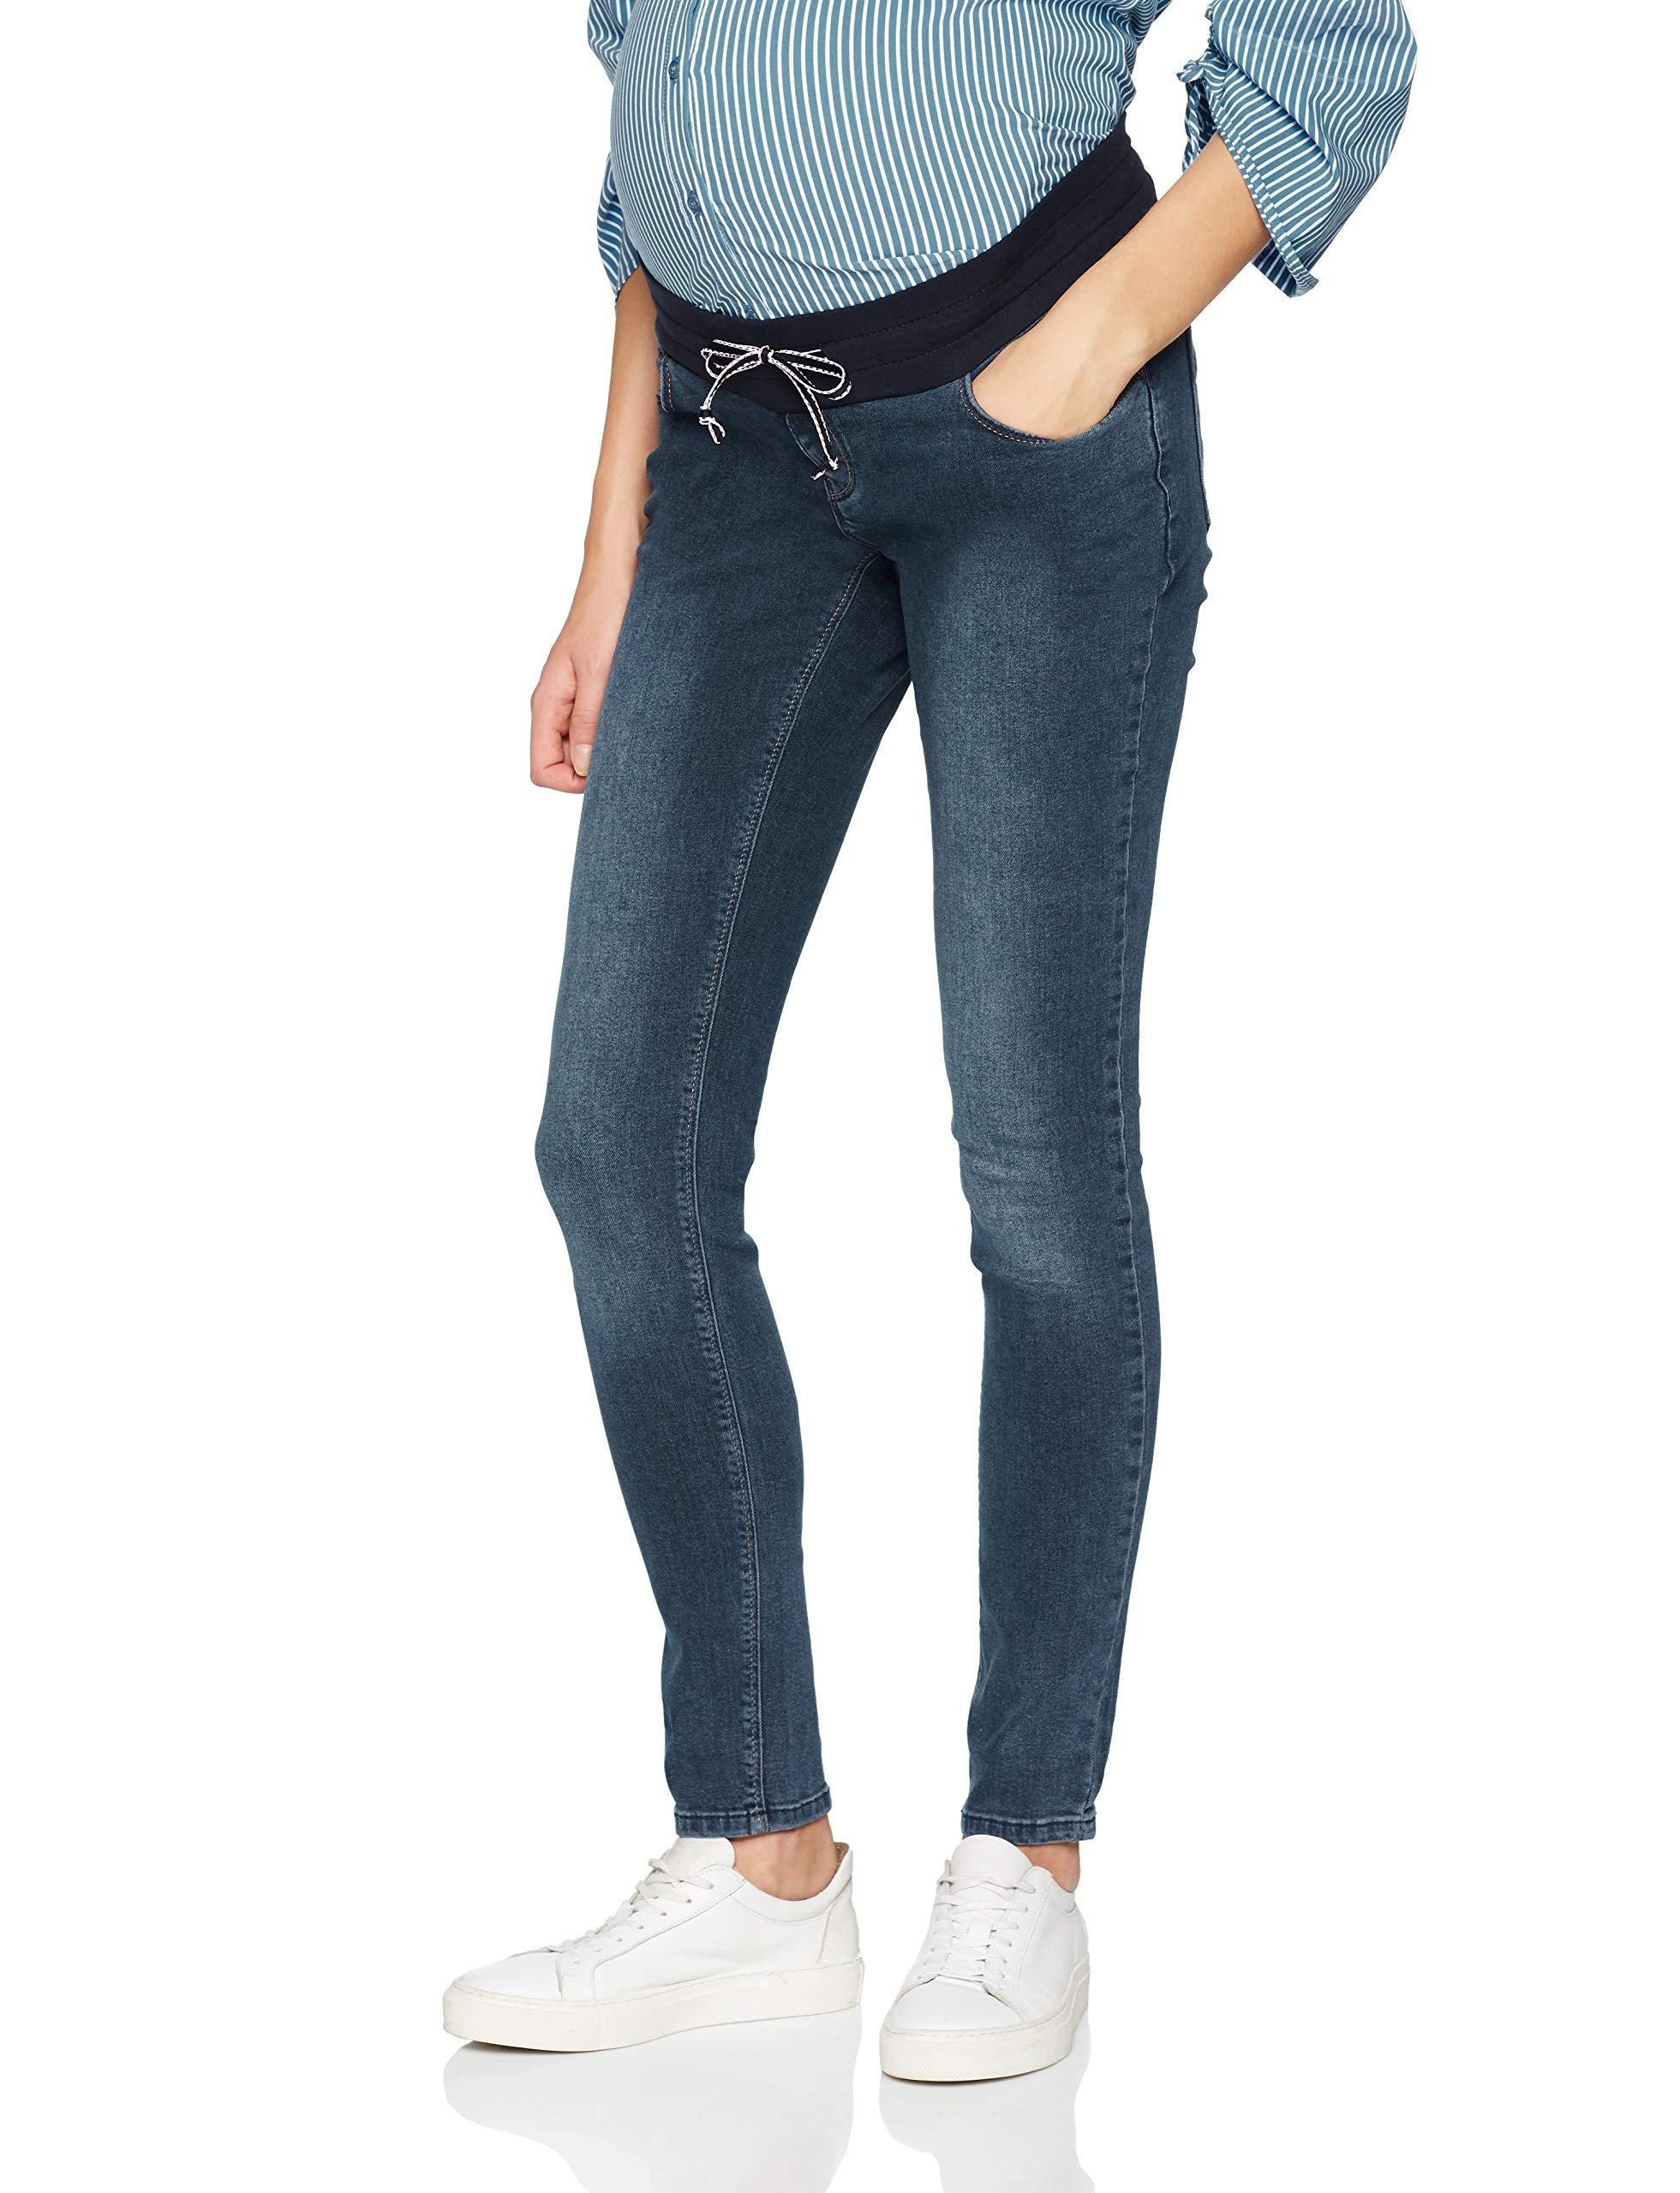 Pants l32taille Fabricant40 Wash 960W31 32Femme Esprit Slim JeansMaternitéBleumedium Denim Utb Maternity ARj354qL